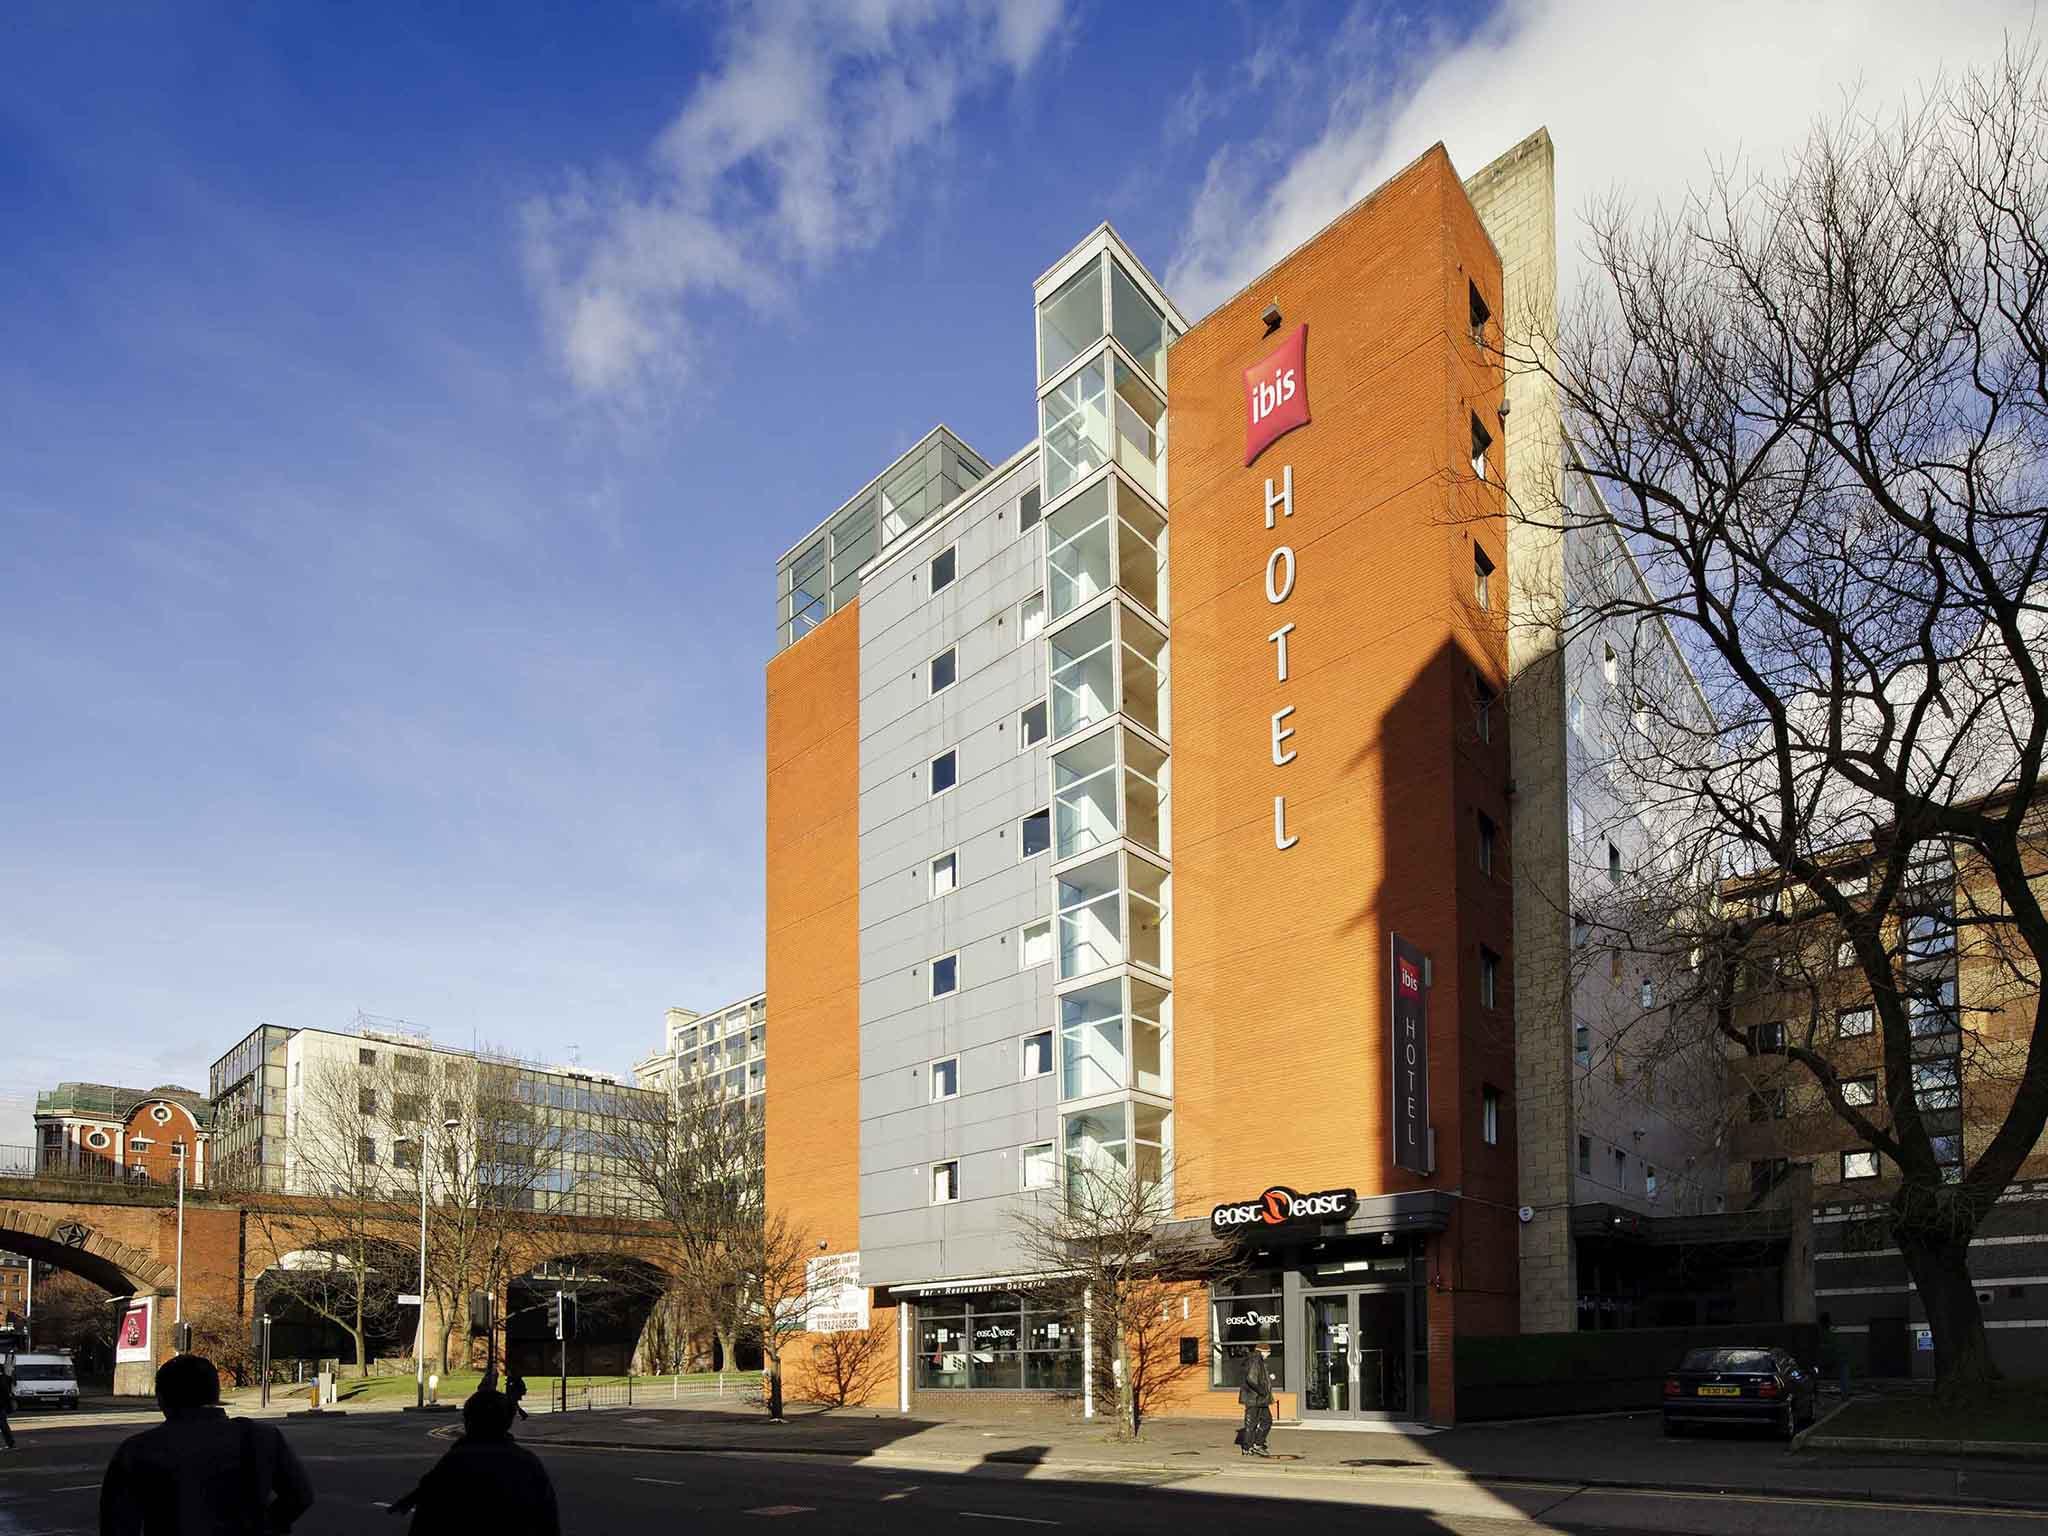 Otel – ibis Manchester Centre Princess Street (new ibis rooms)